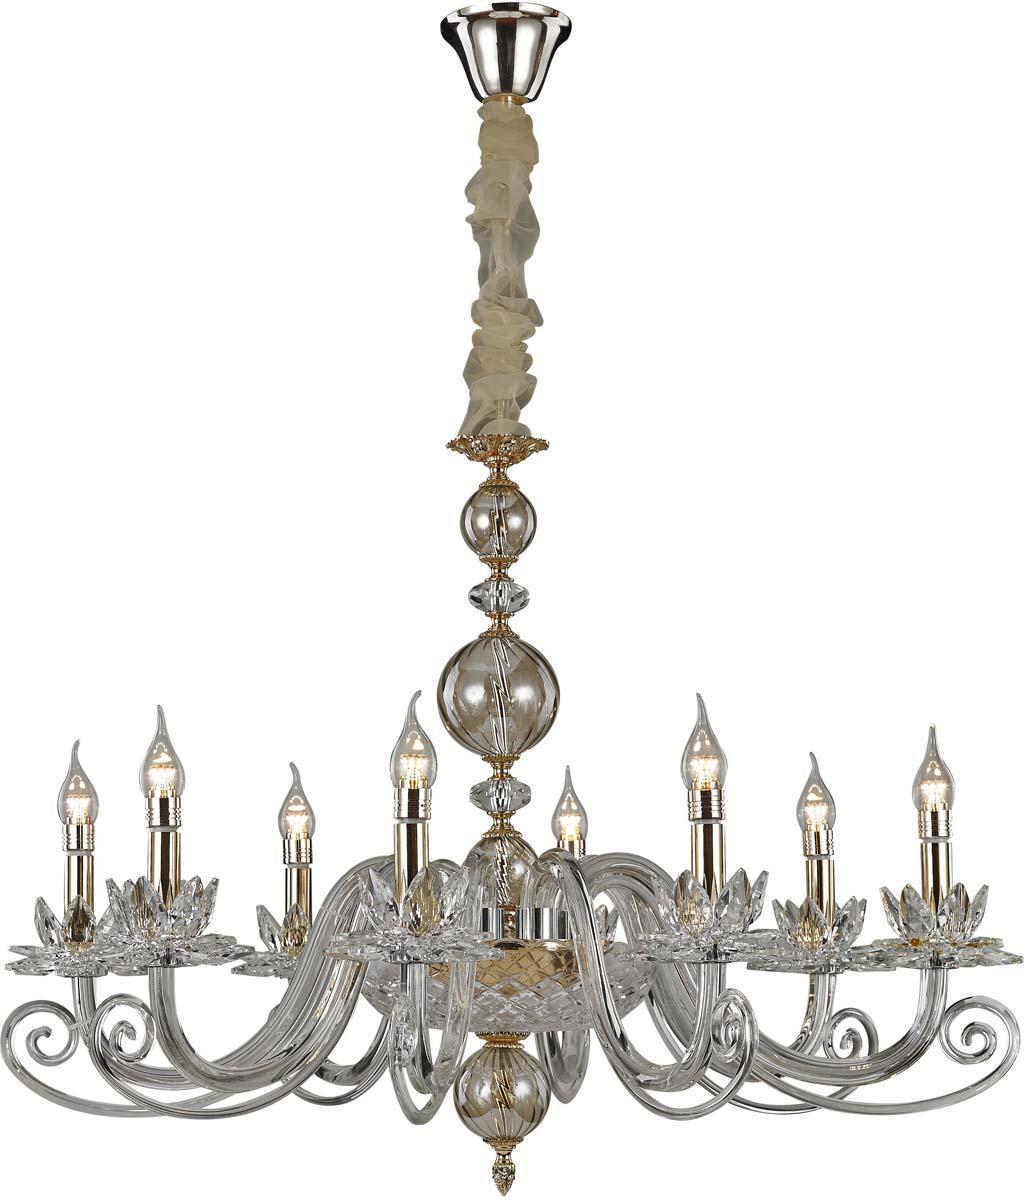 Светильник подвесной Divinare Firenze, 8 х E14, 40 W. 8820/09 LM-88820/09 LM-8